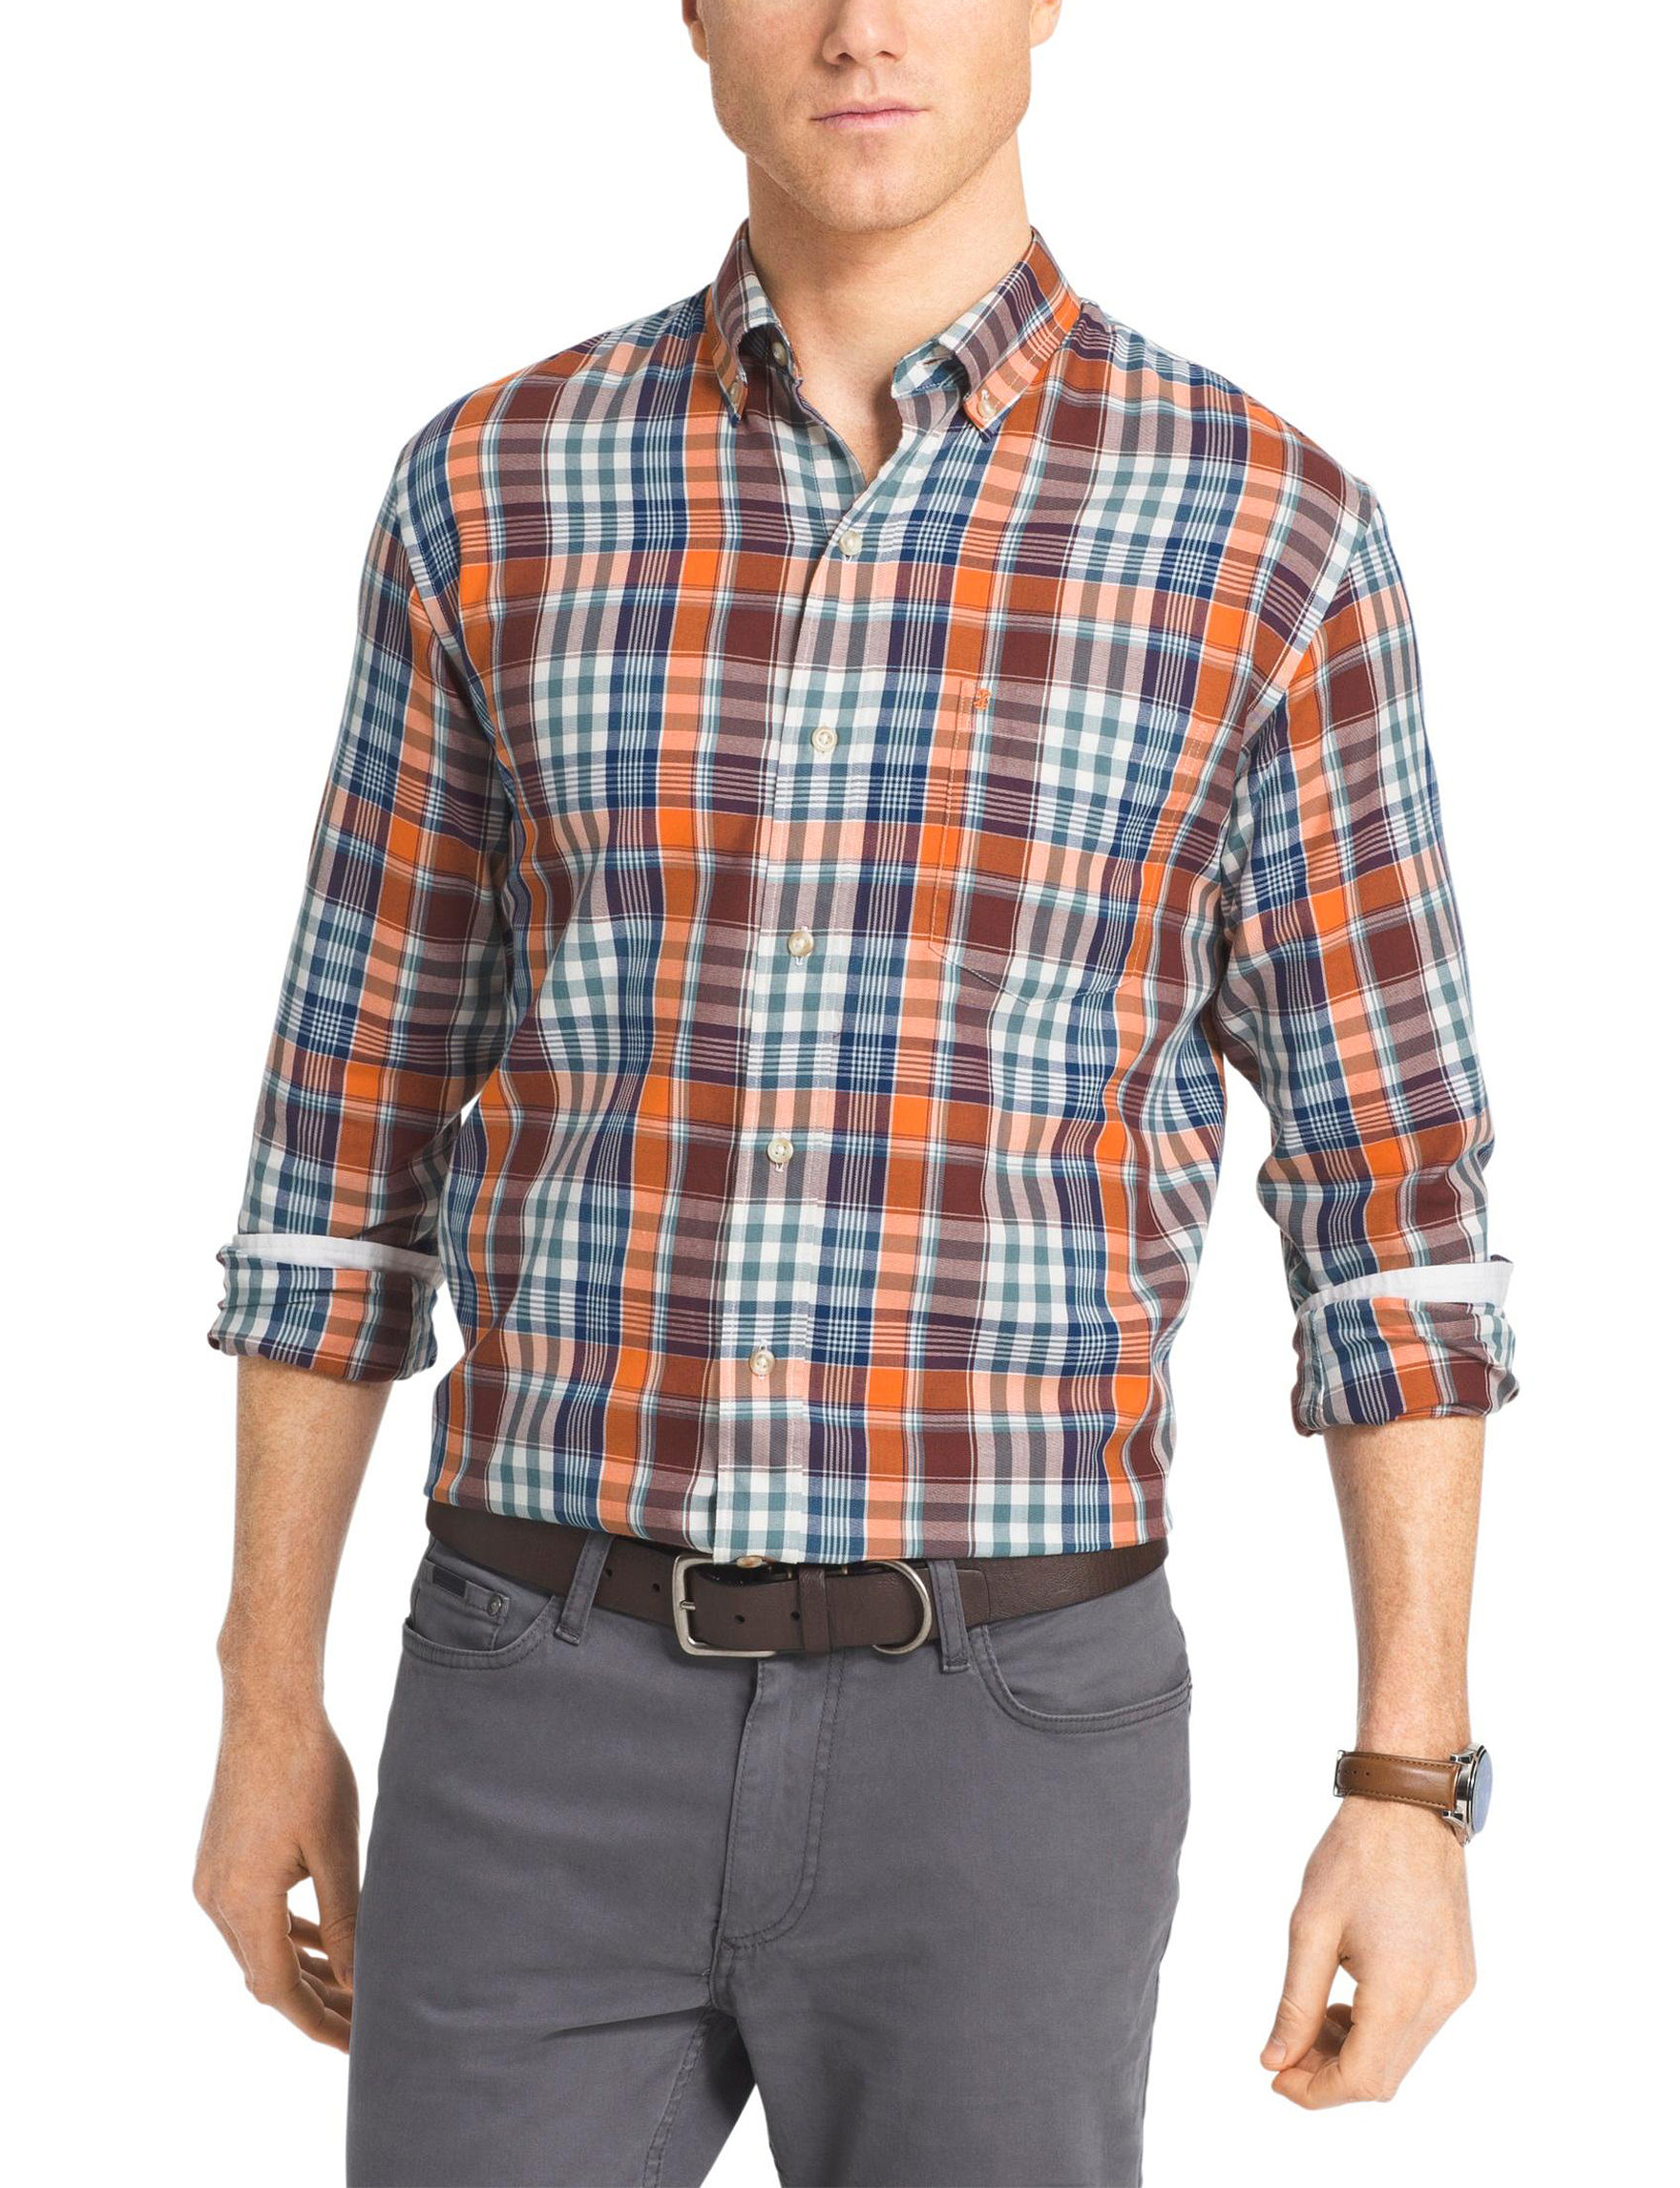 Izod Orange Casual Button Down Shirts